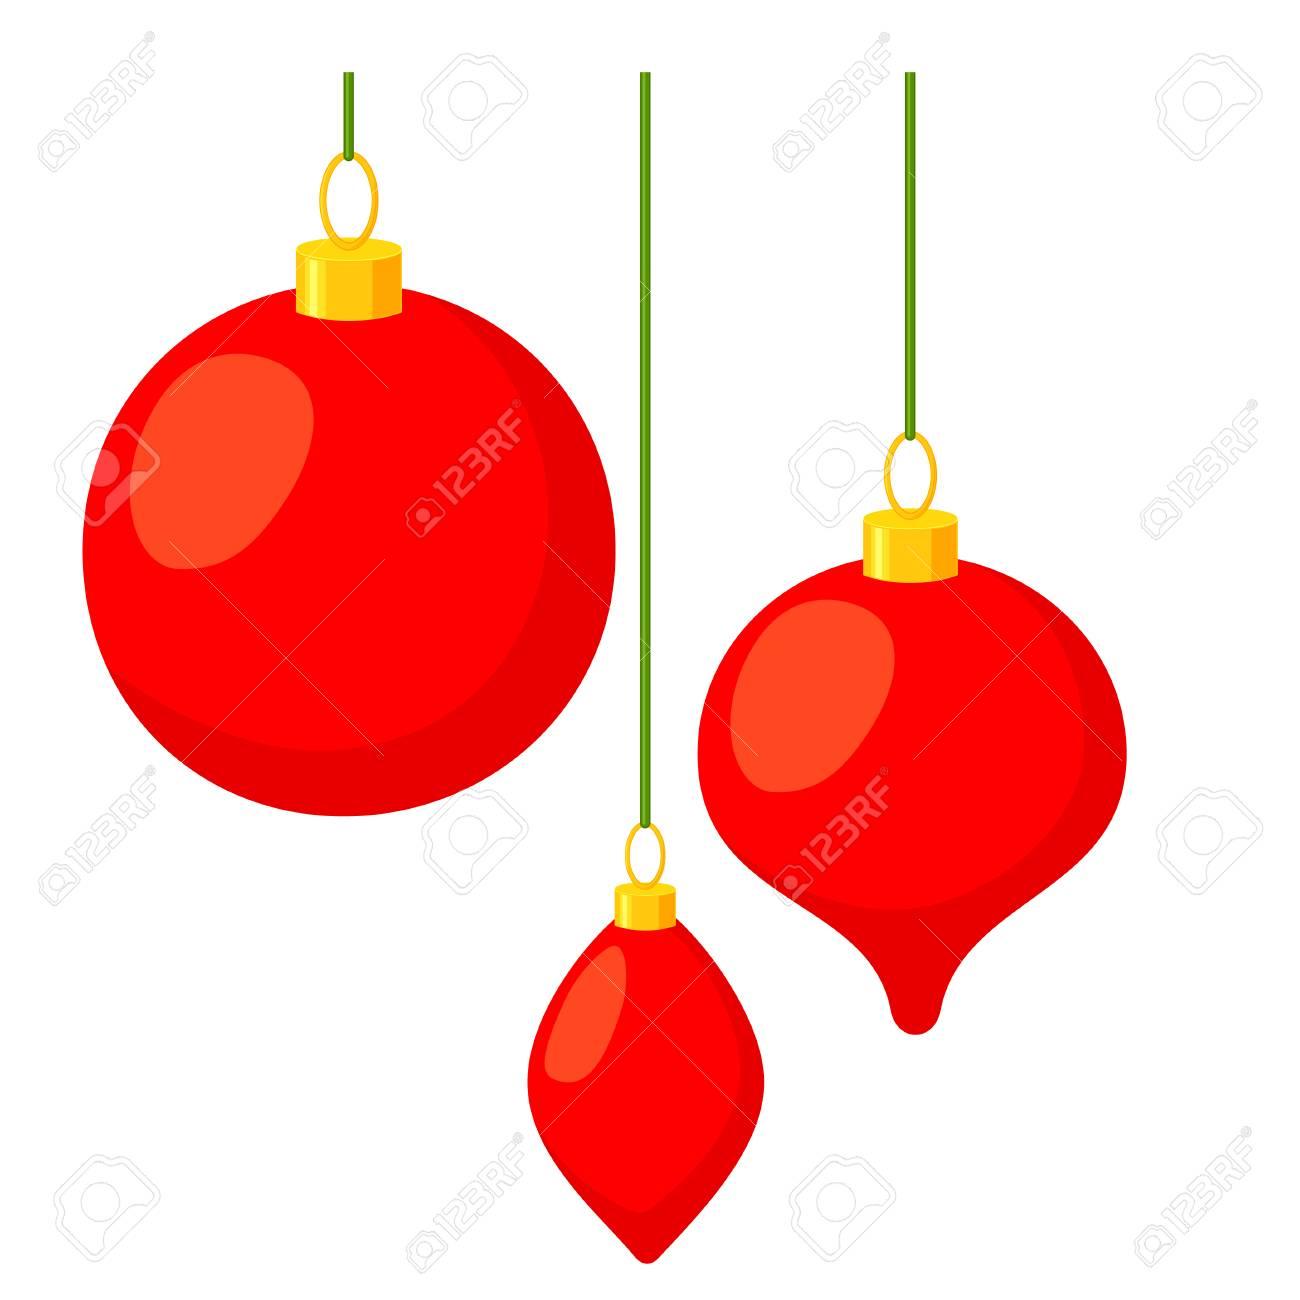 Colorful Cartoon Christmas Tree Decorations Set Three Hanging